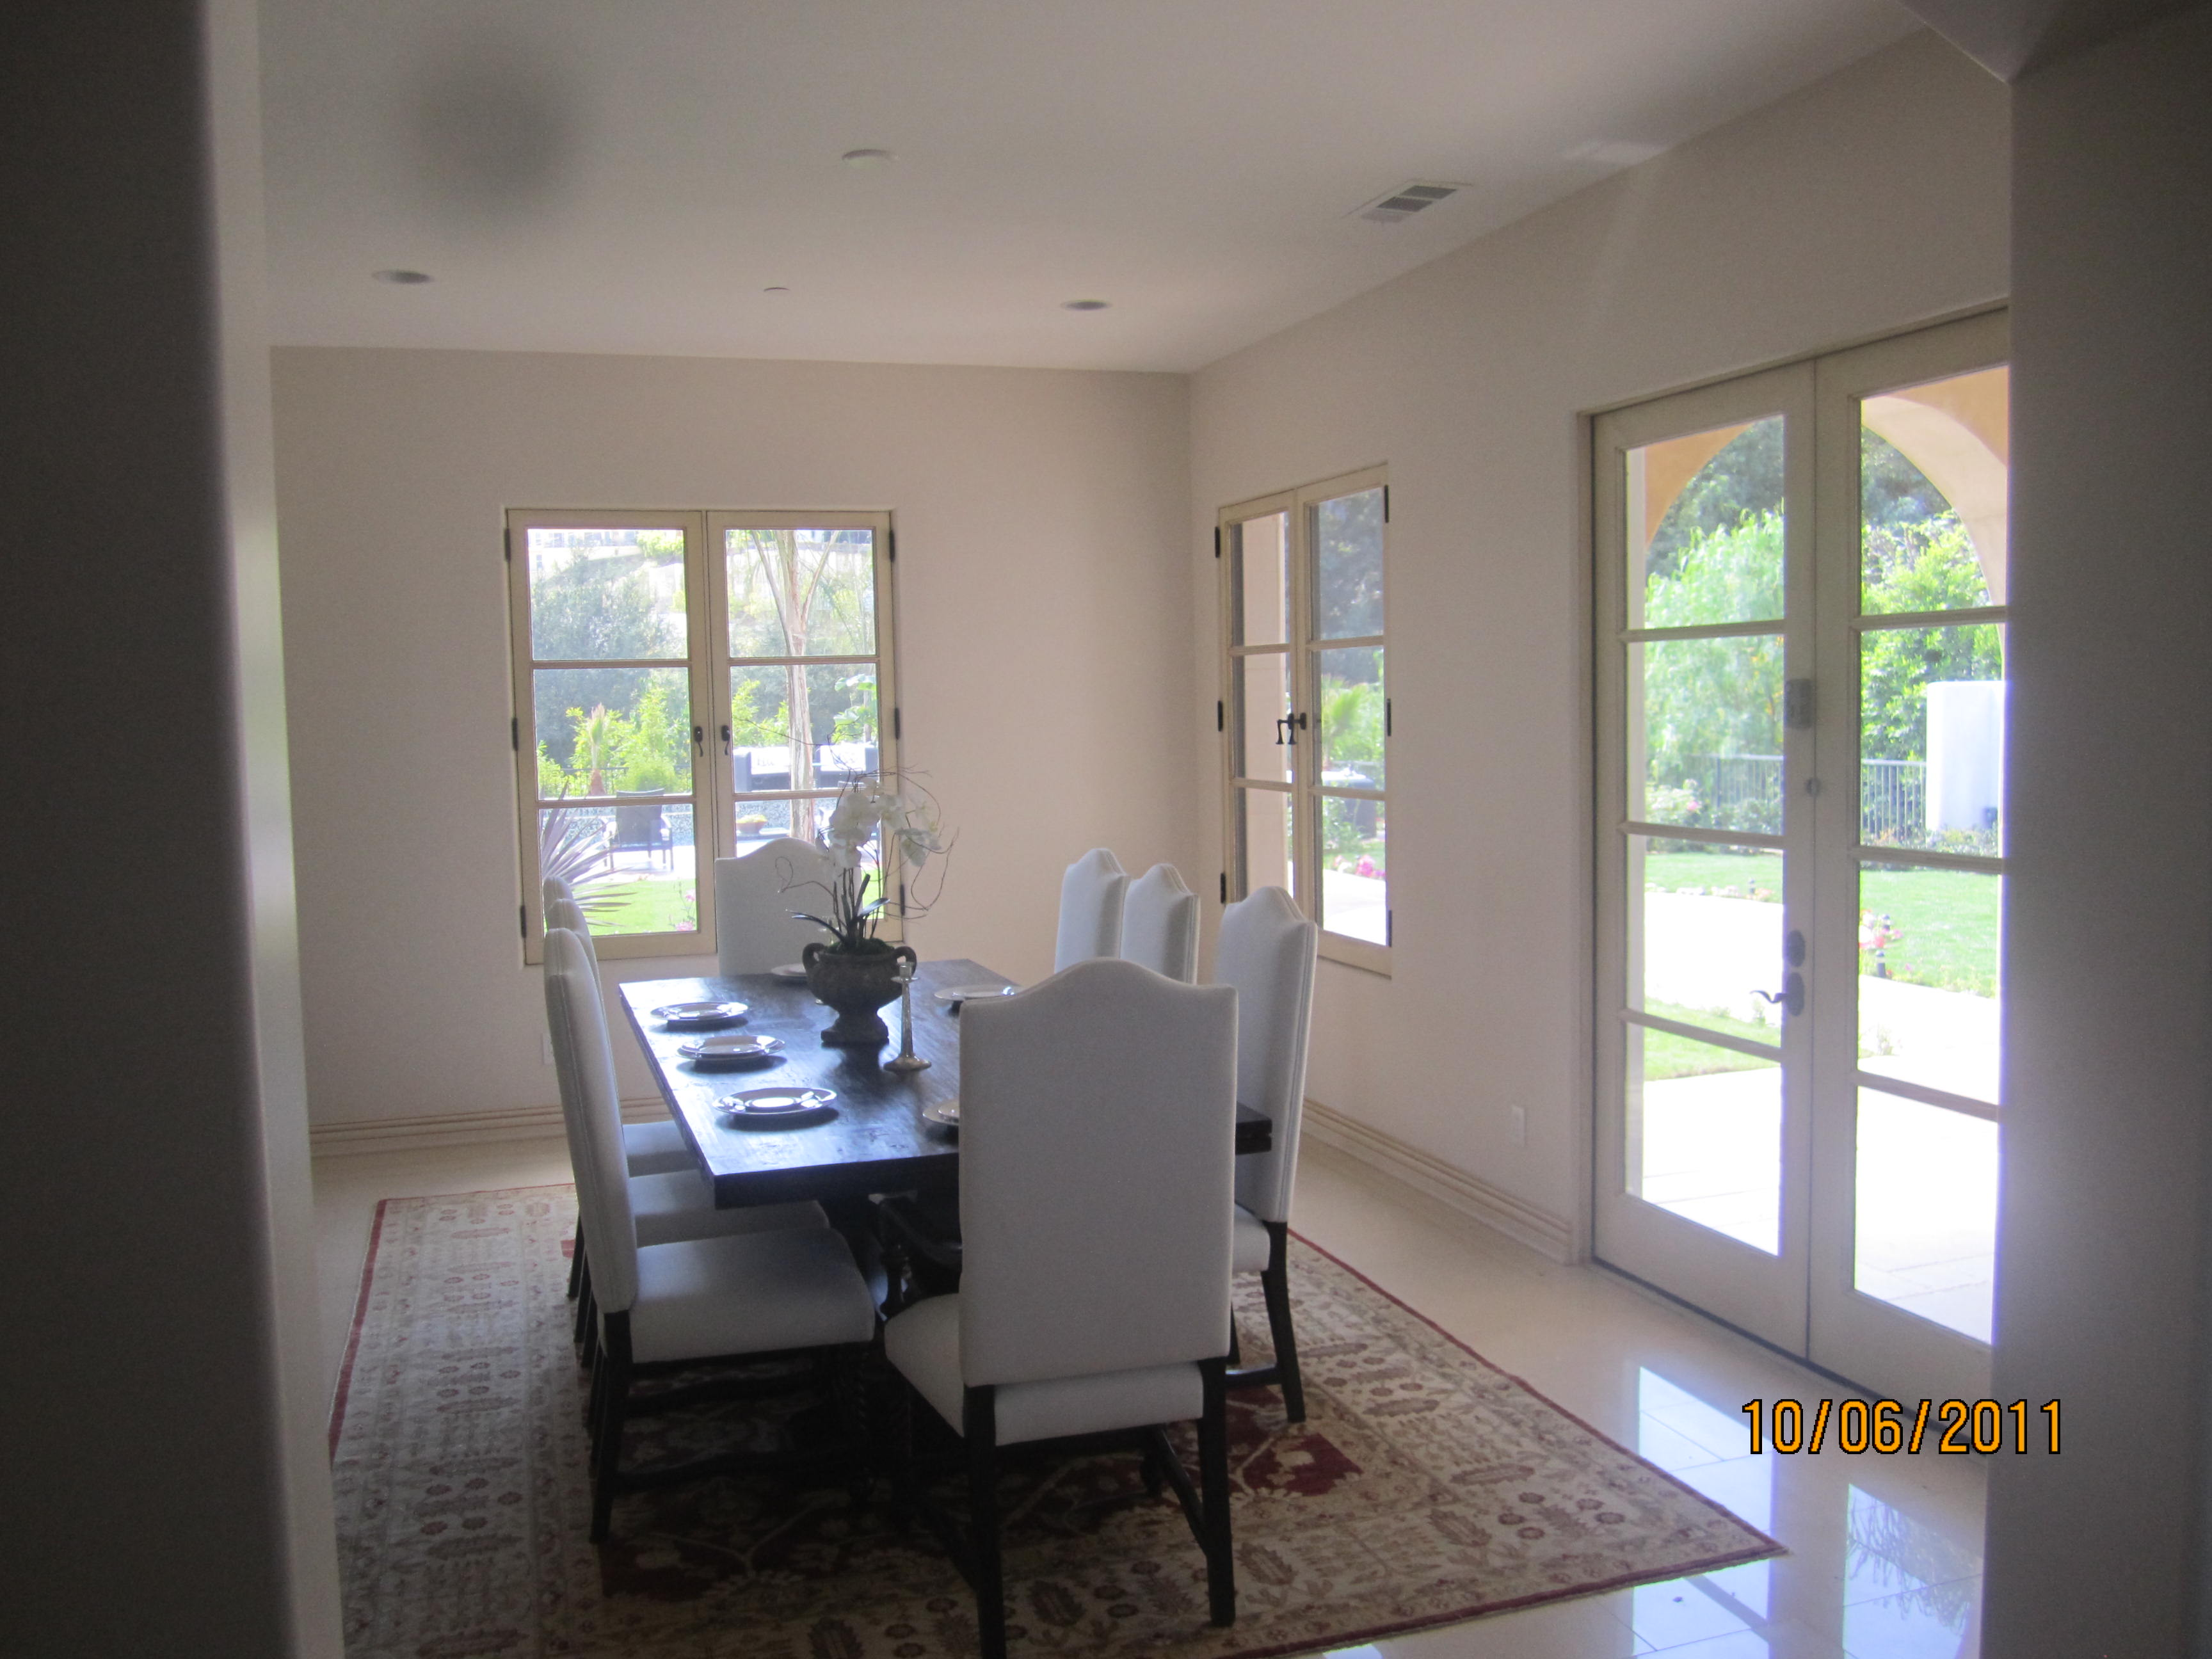 Kitchen Interior Window Screens and French Doors Malibu